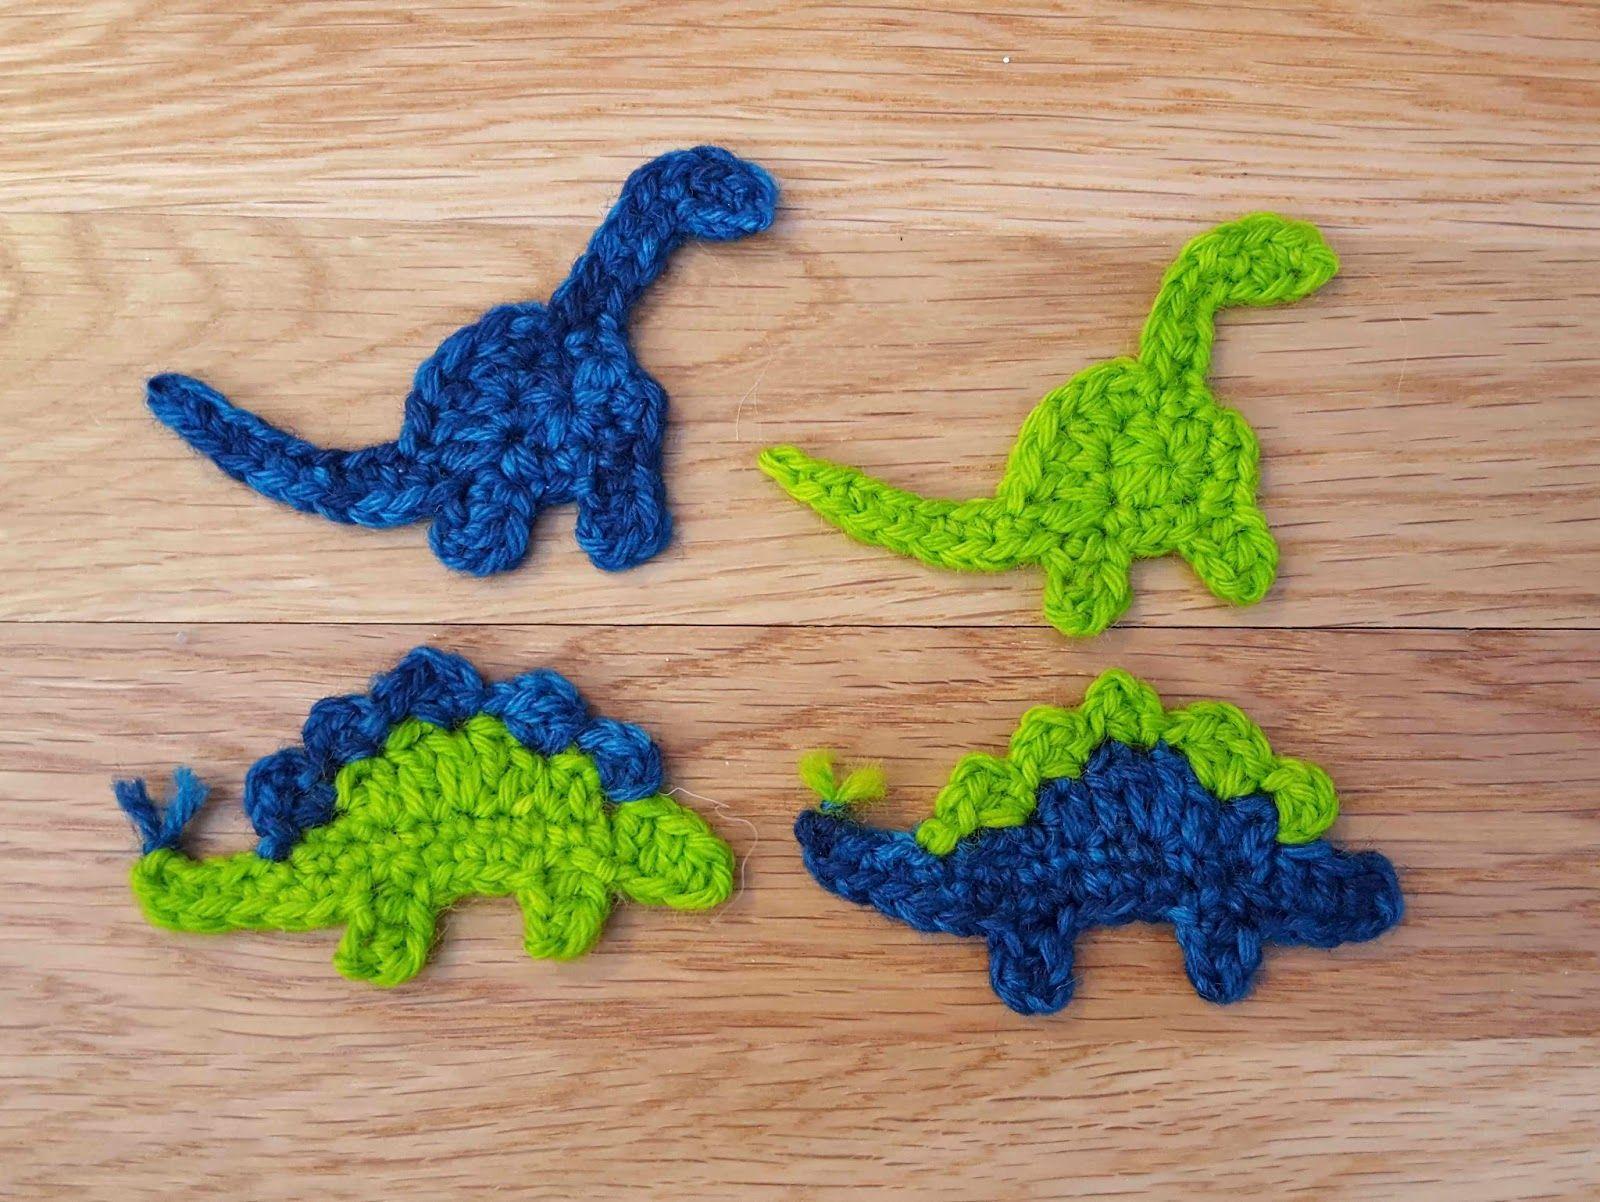 40+ Pretty Picture of Dinosaur Crochet Patterns #crochetdinosaurpatterns